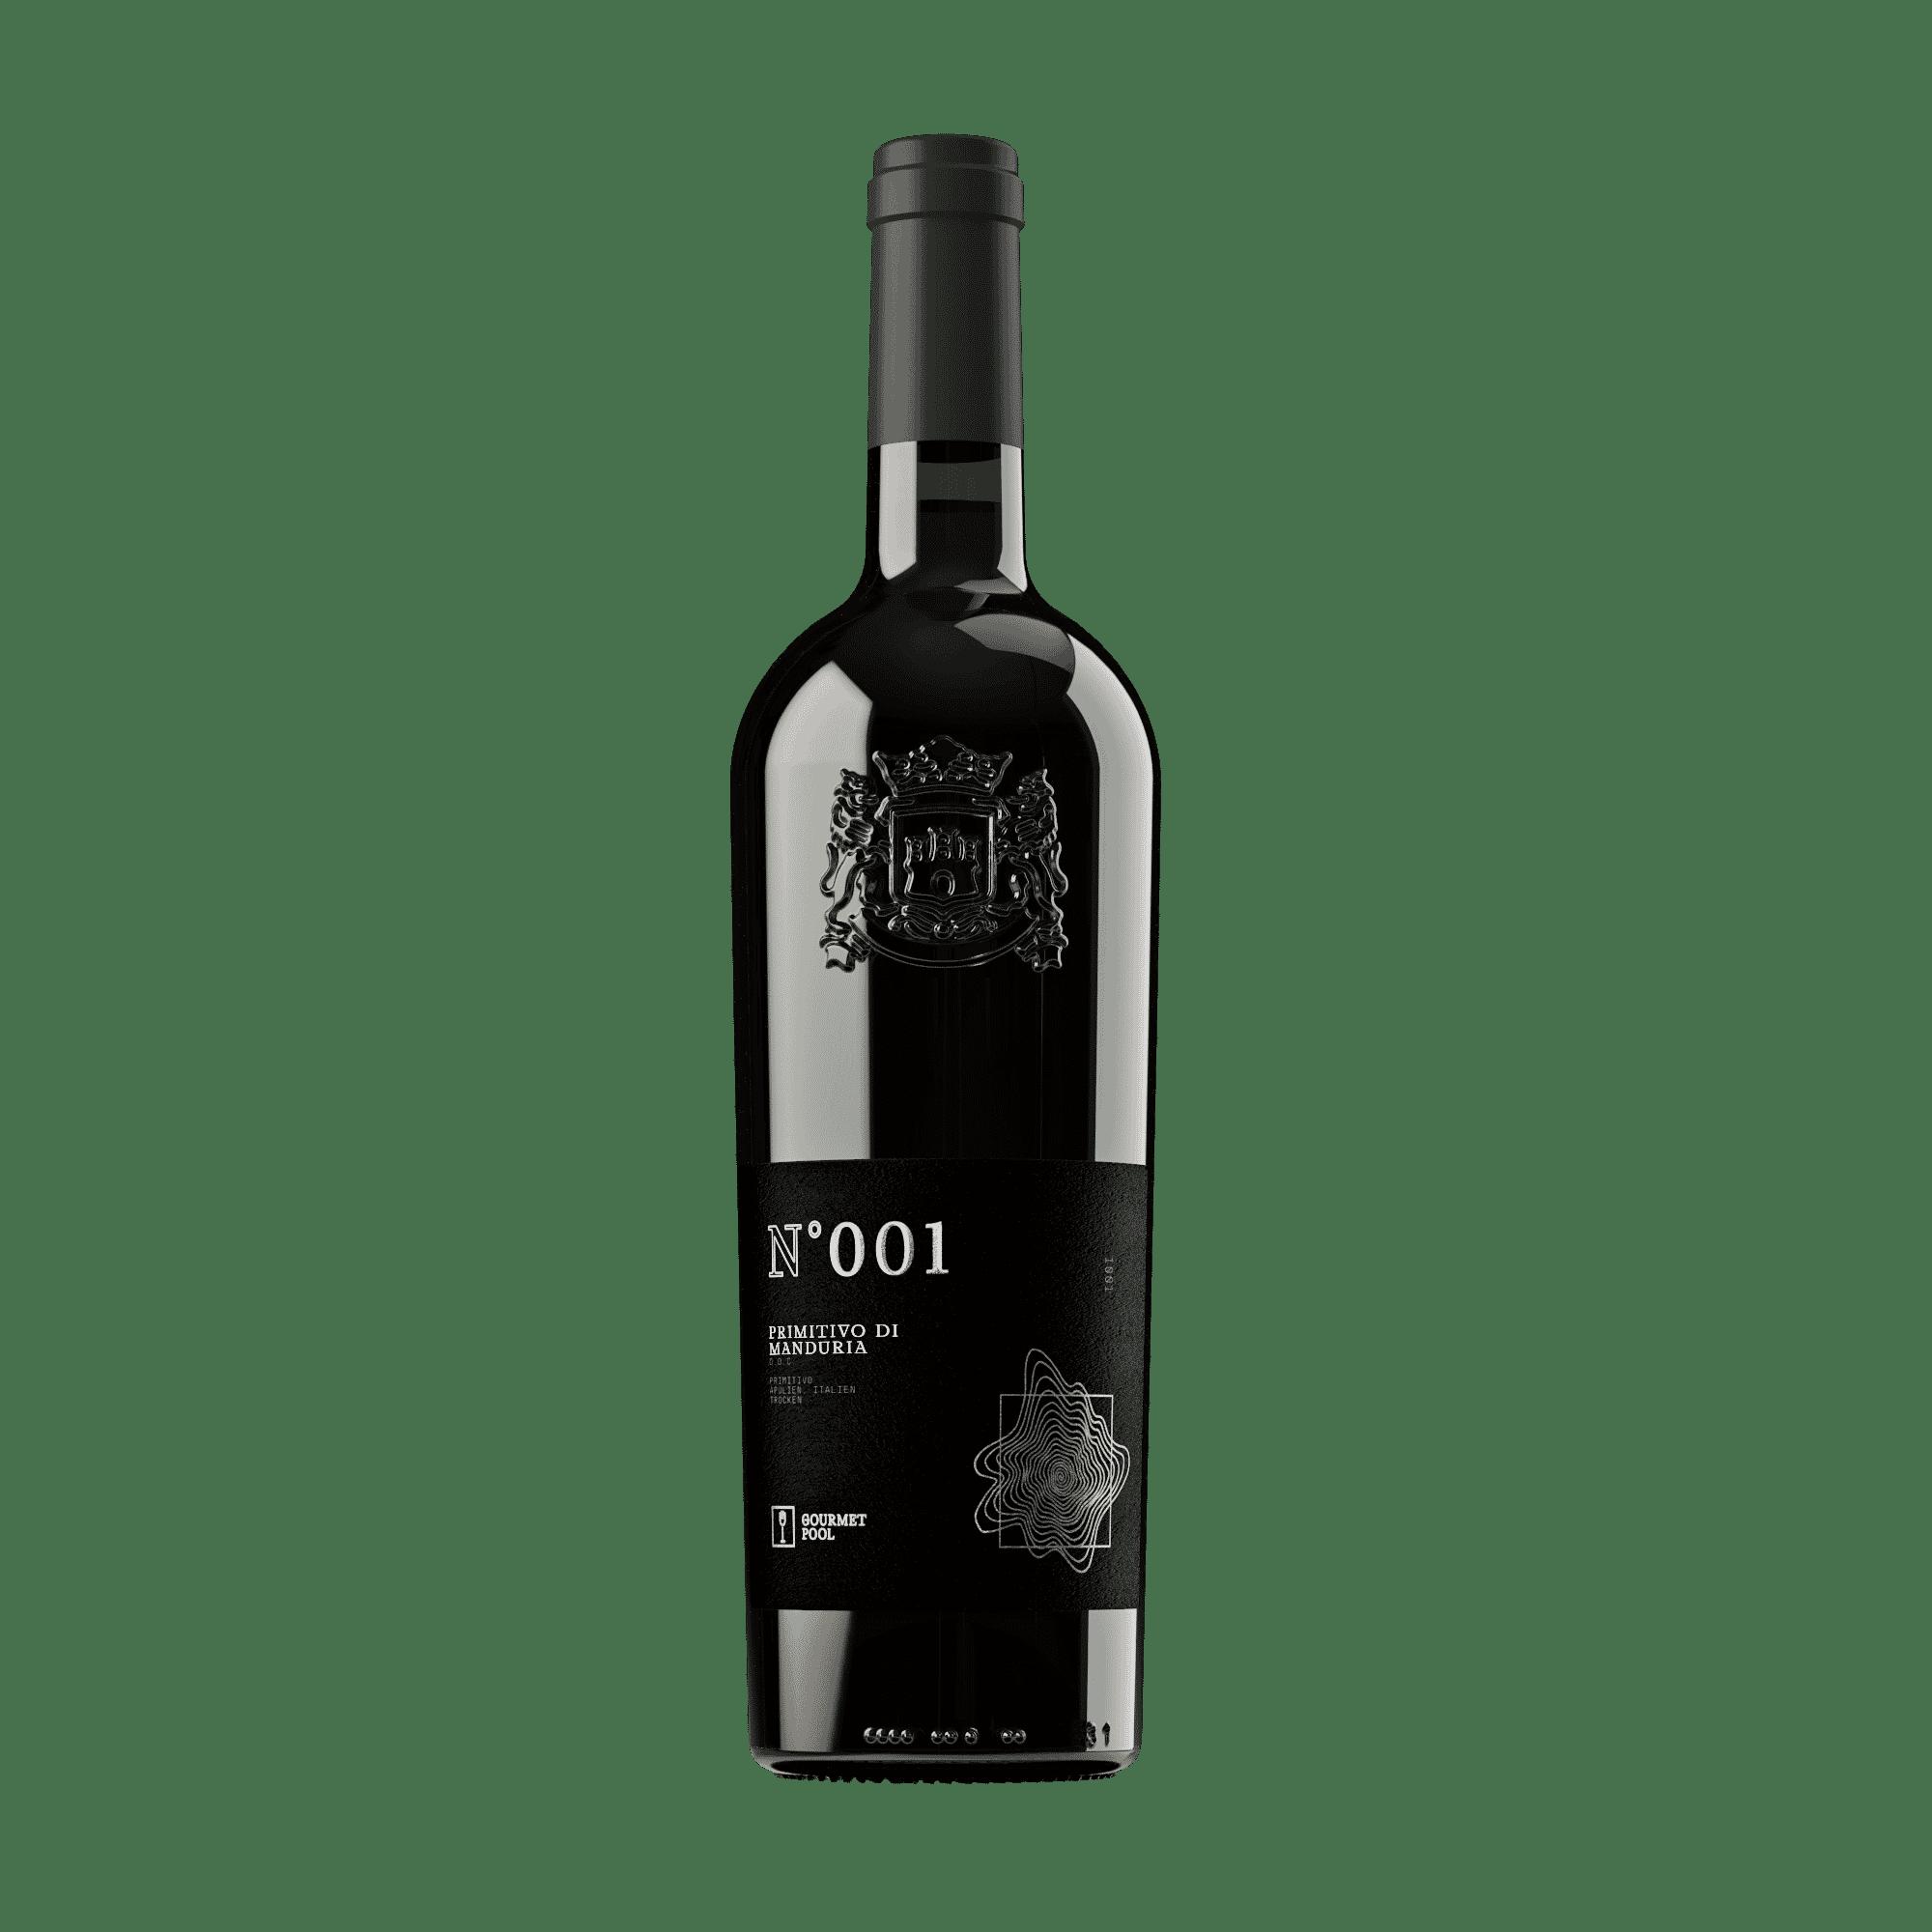 GourmetPool N001 Primitivo Vorderseite